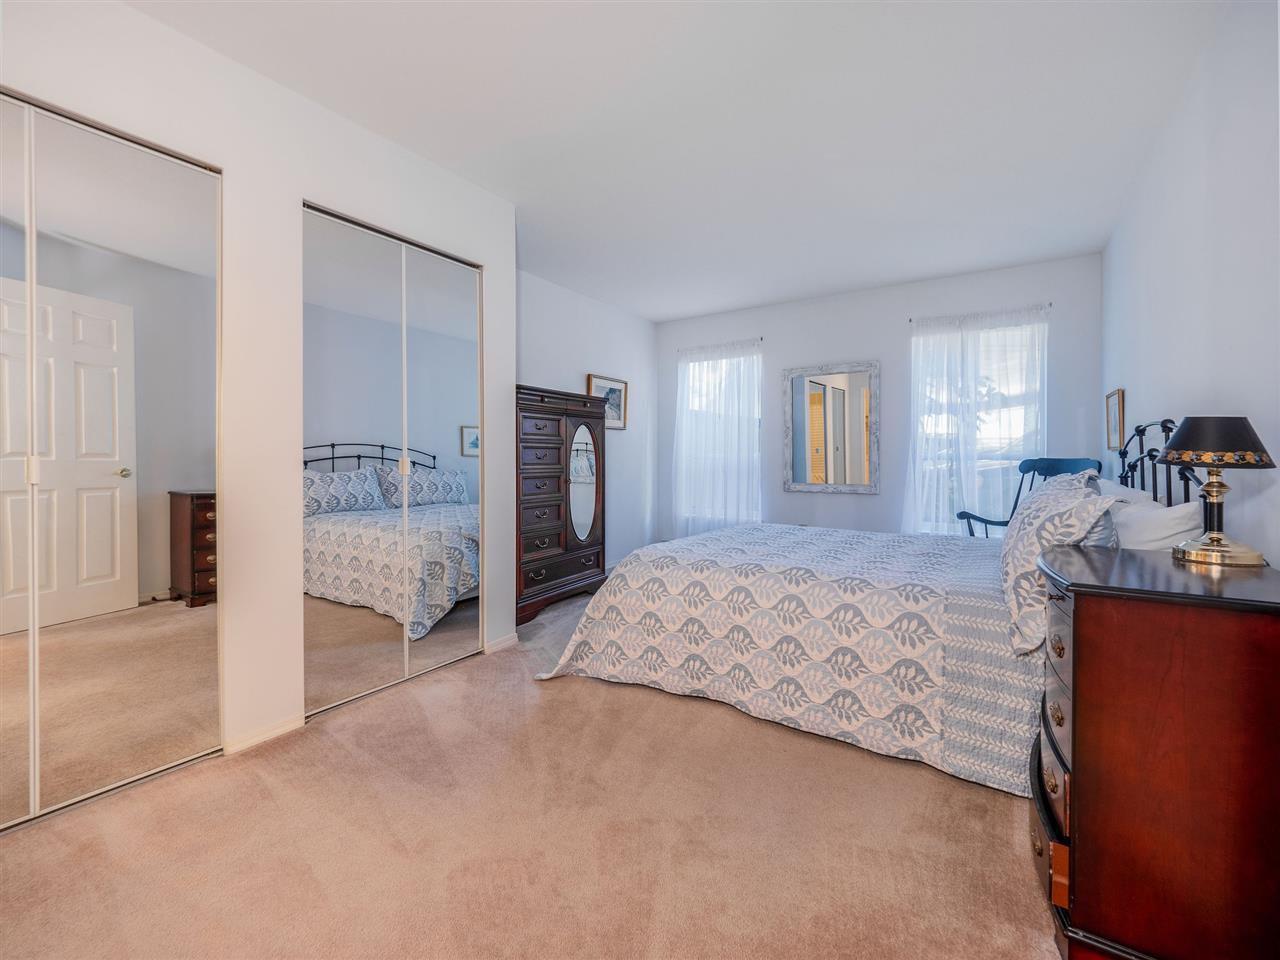 "Photo 11: Photos: 105 5768 MARINE Way in Sechelt: Sechelt District Condo for sale in ""Cypress Ridge"" (Sunshine Coast)  : MLS®# R2446337"